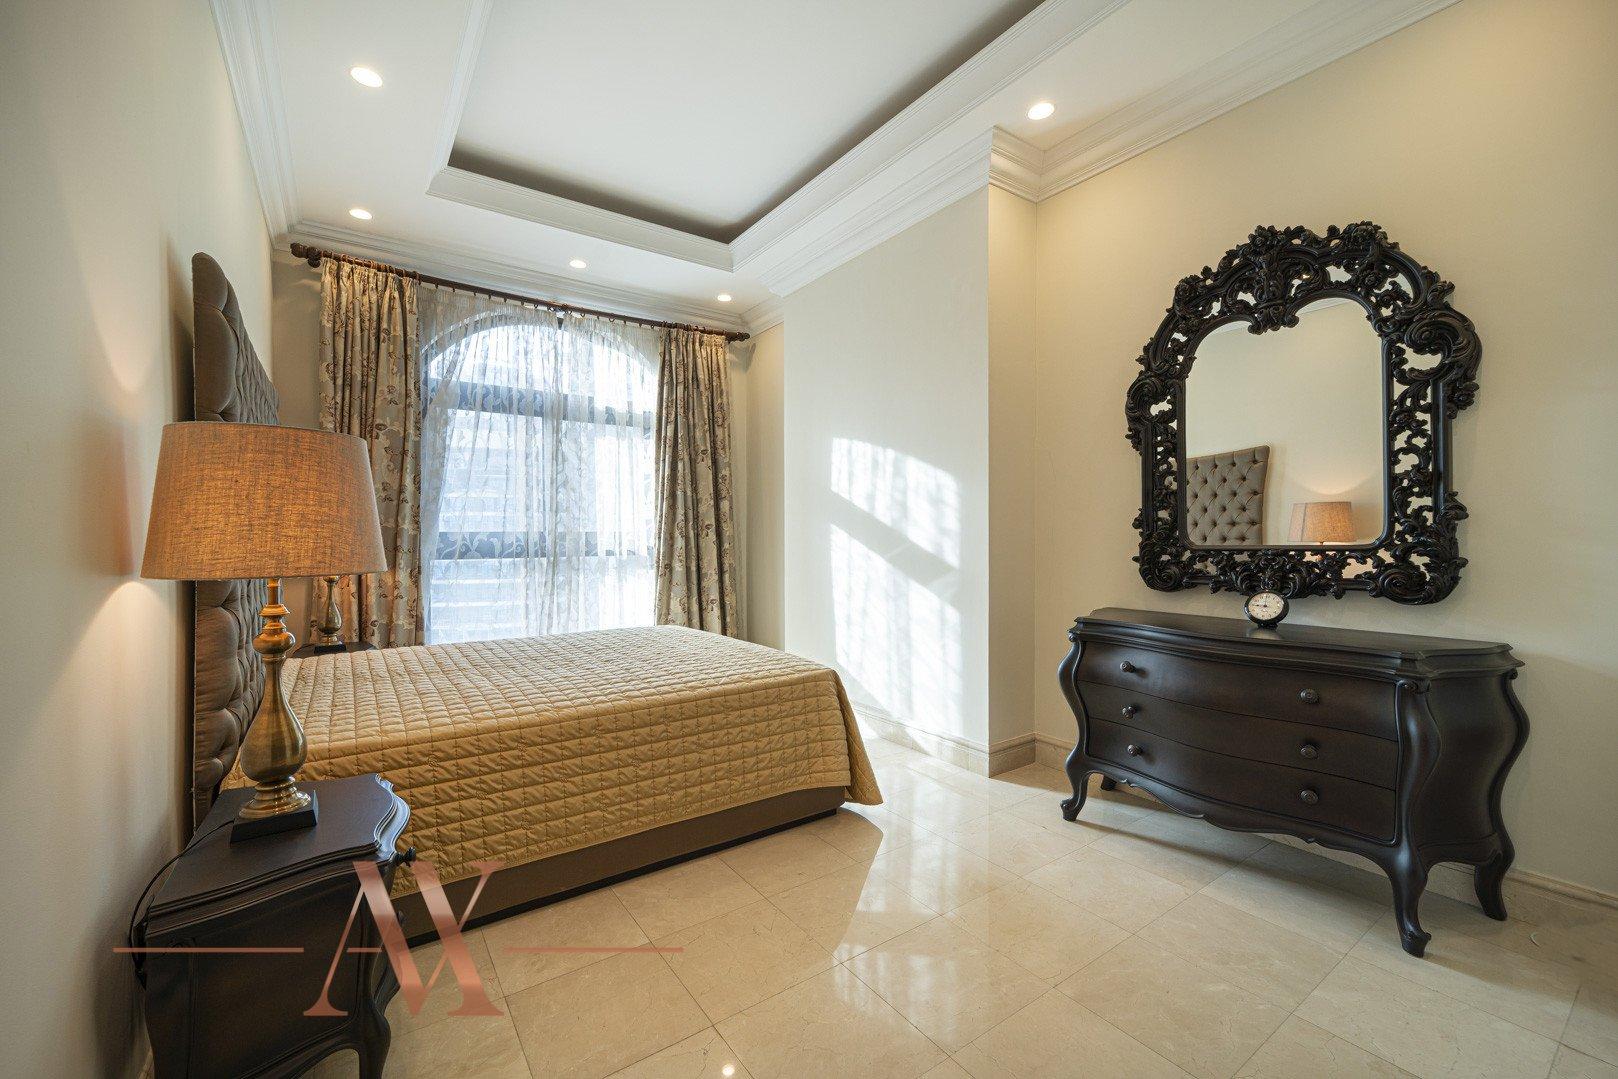 Penthouse for sale in Dubai, UAE, 5 bedrooms, 1057 m2, No. 23747 – photo 10